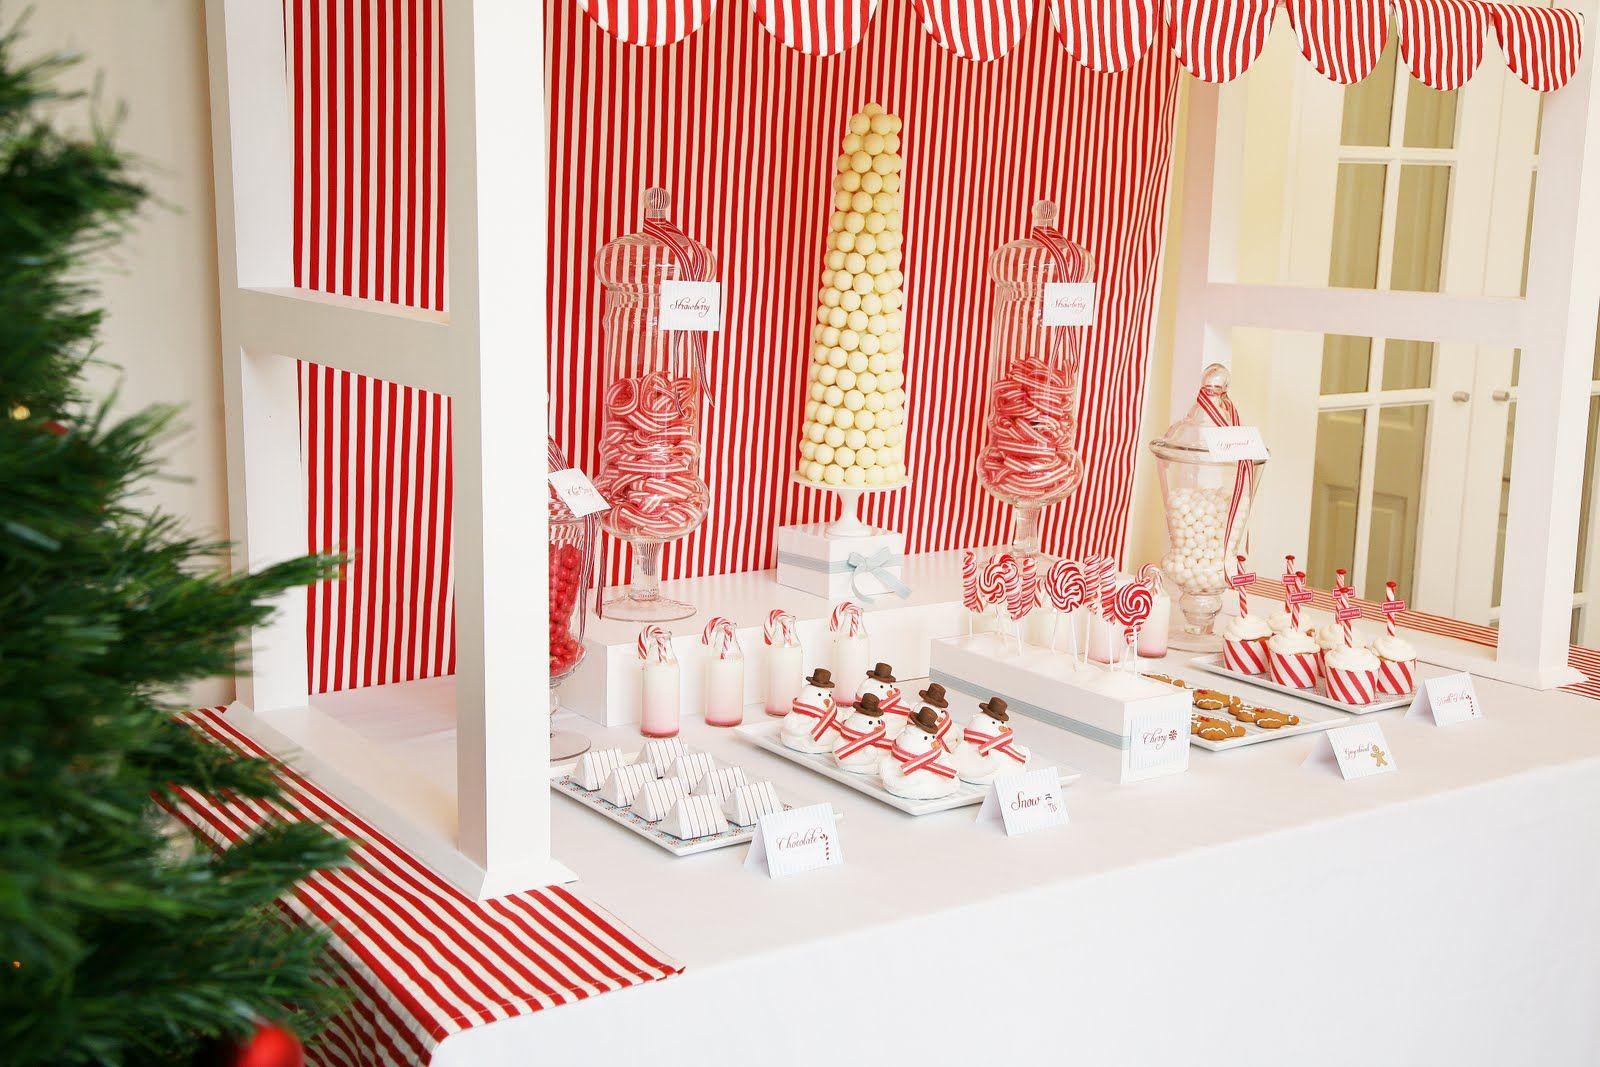 Christmas dessert table decoration ideas - Candyland Dessert Table Ideas